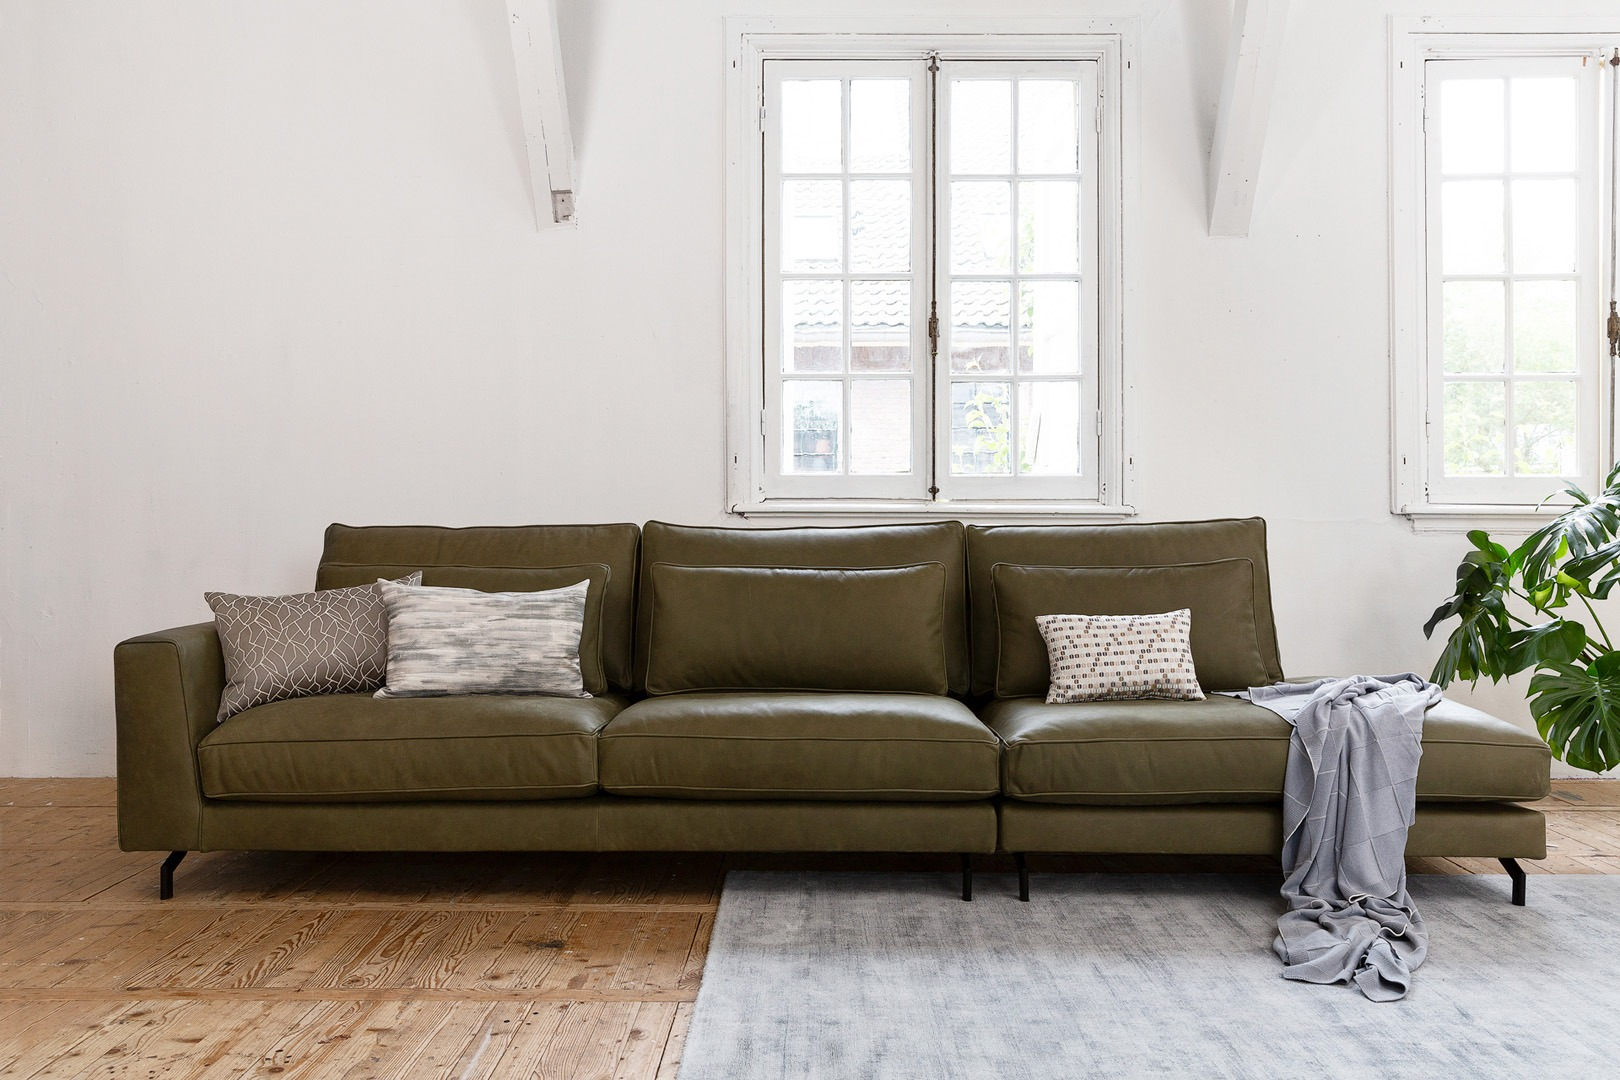 sweet-portobello-ottoman-terminal-groen-leer-soofs-interieur-. (1)